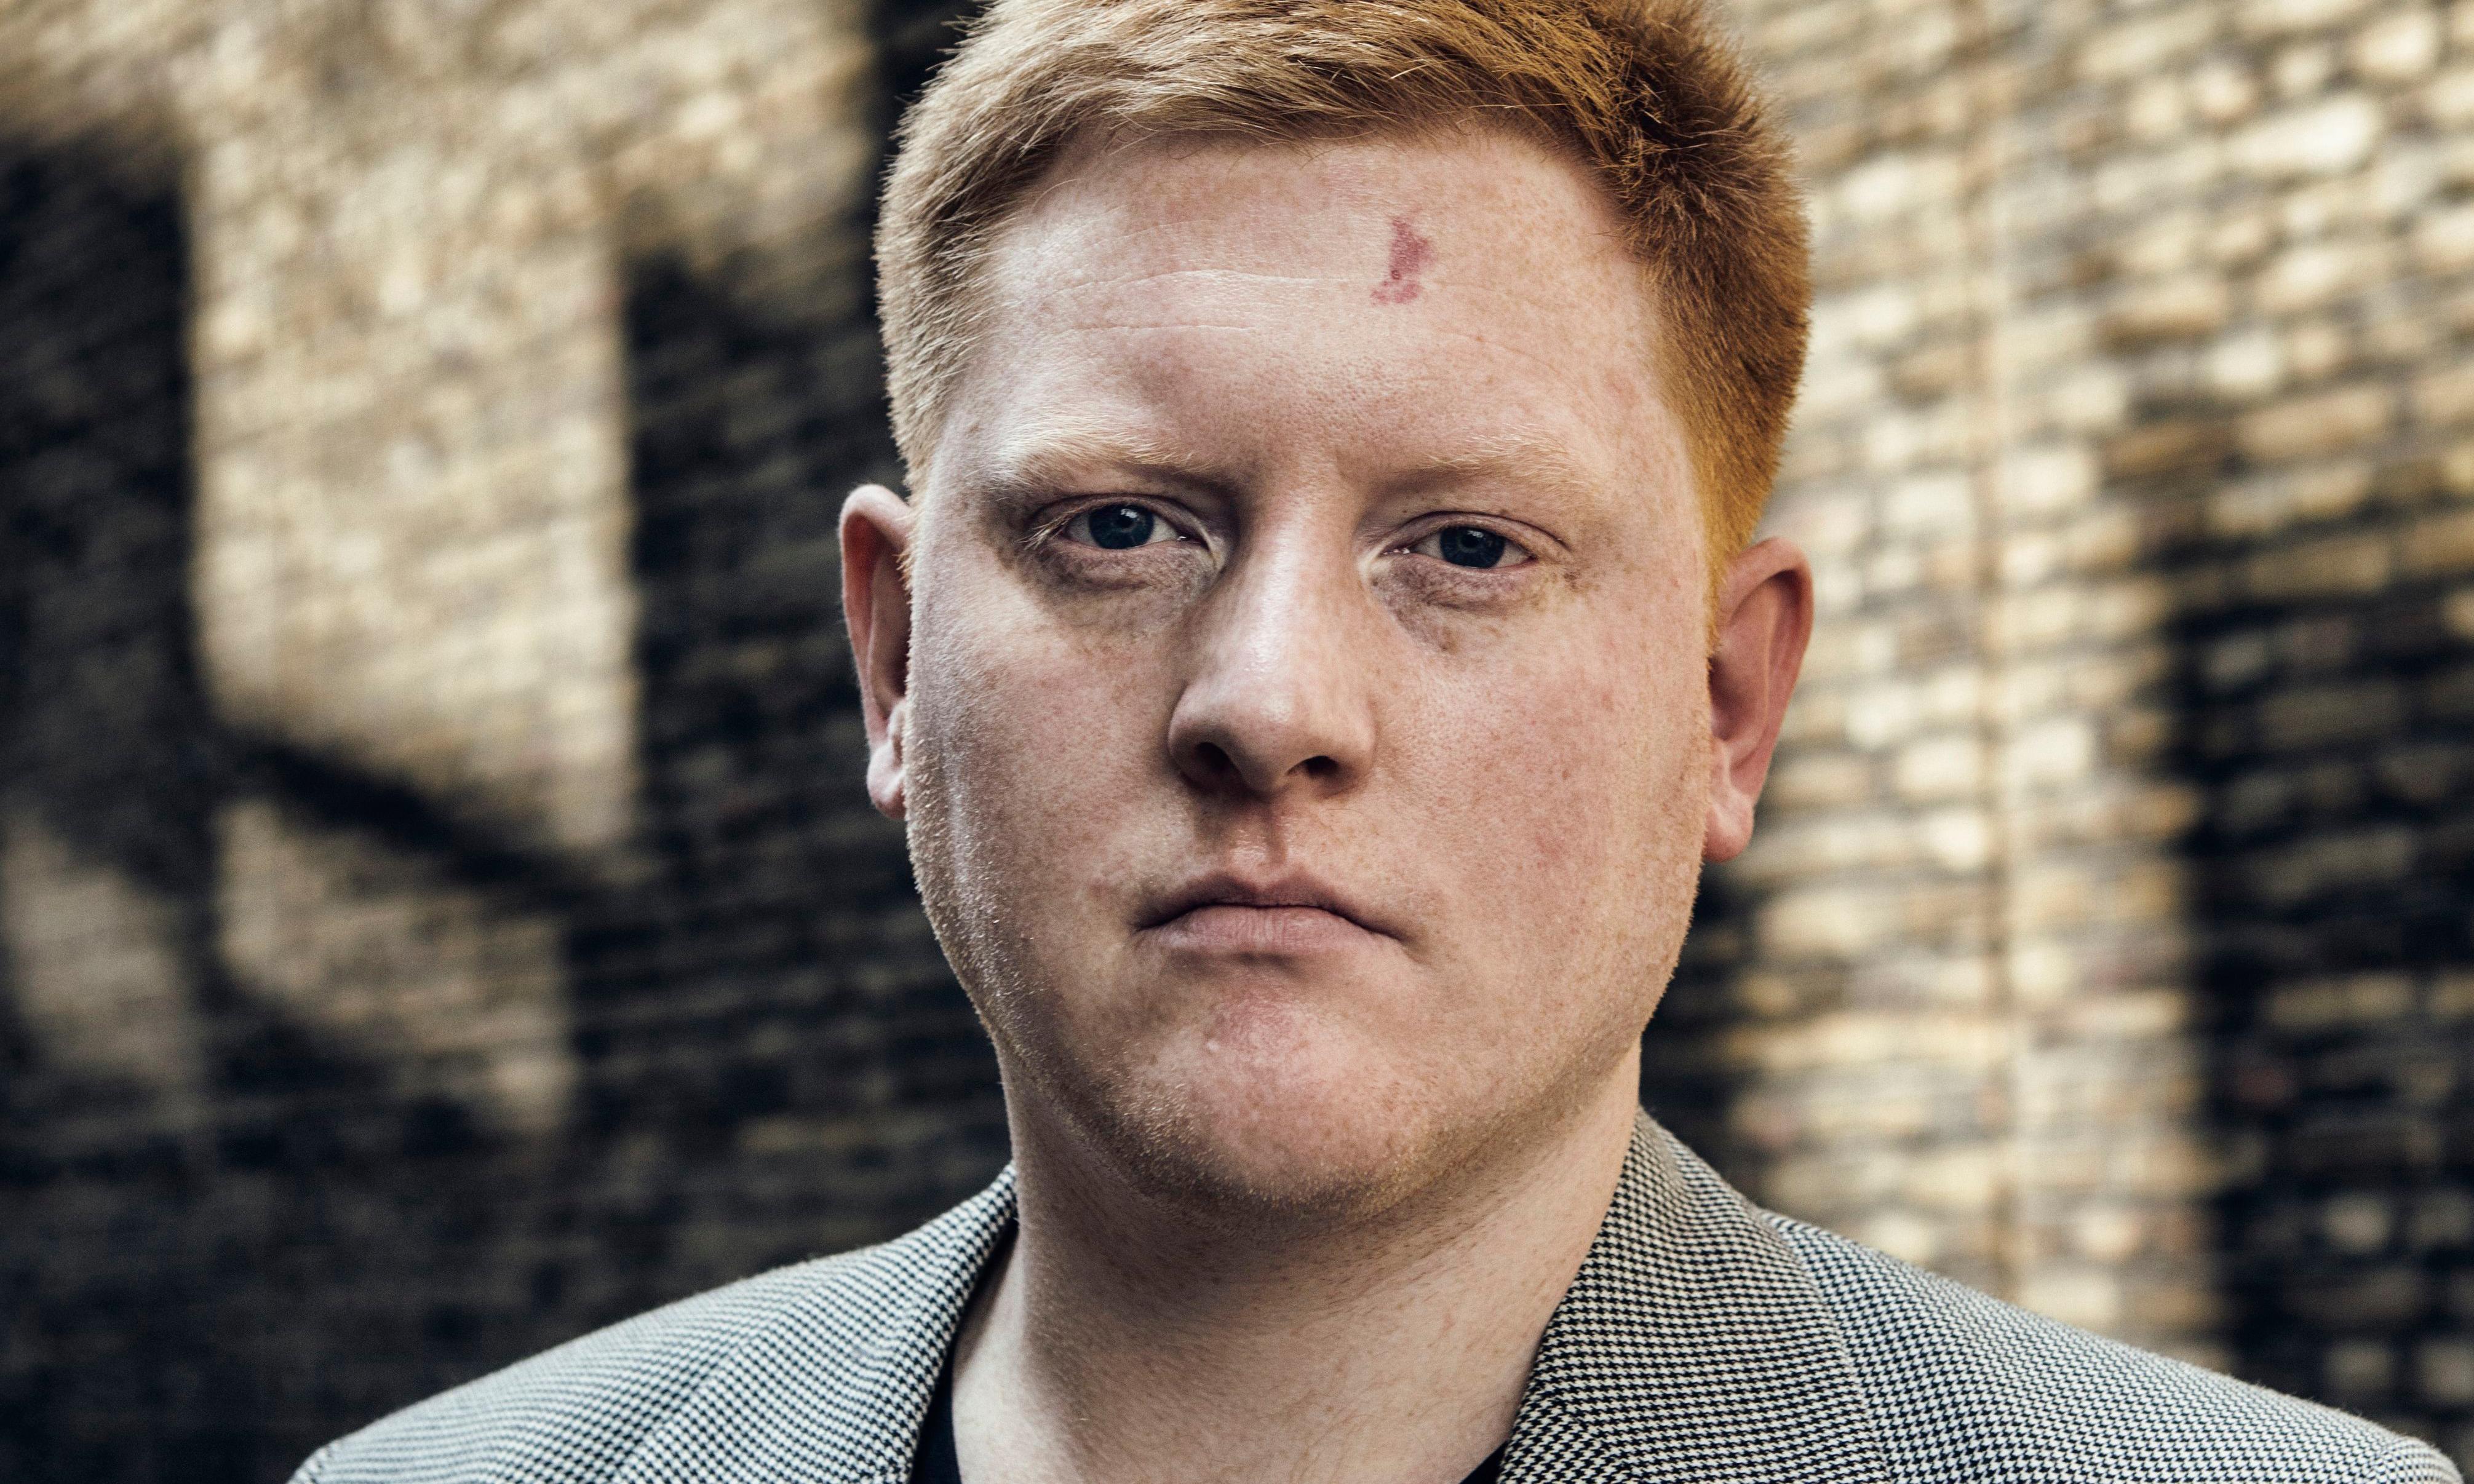 Sheffield Hallam MP Jared O'Mara arrested on suspicion of fraud